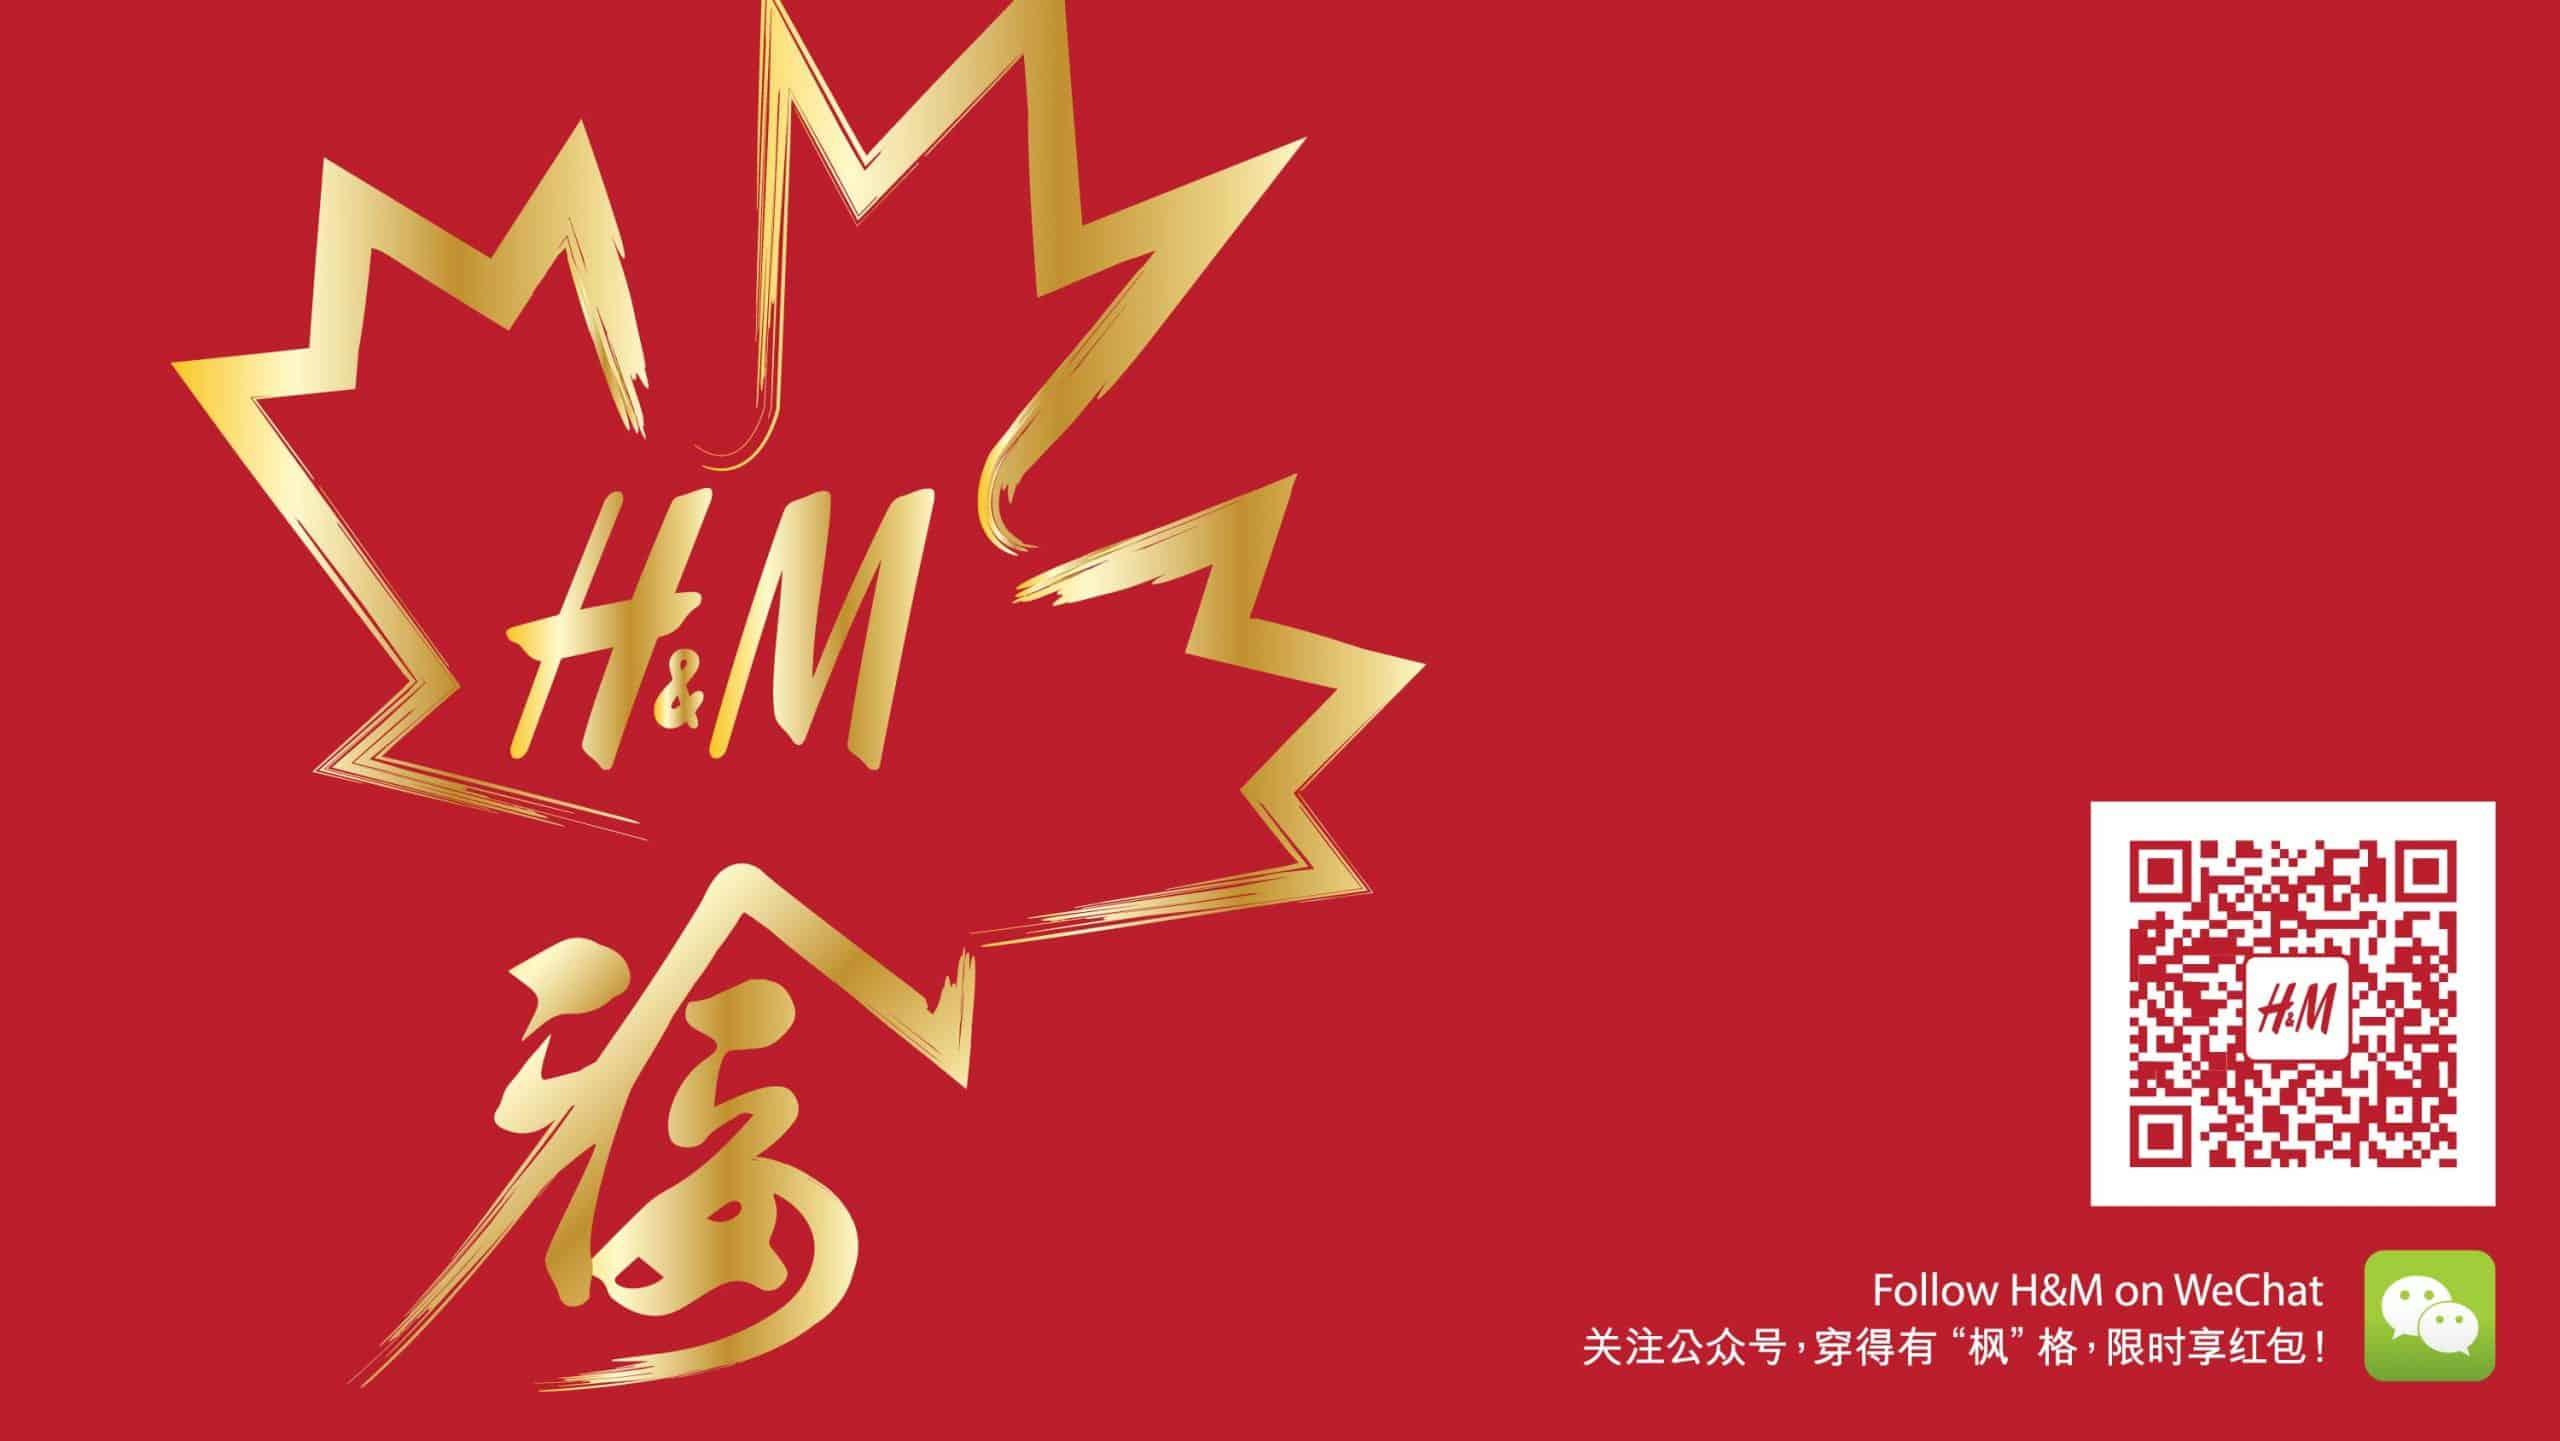 H&M Canada WeChat